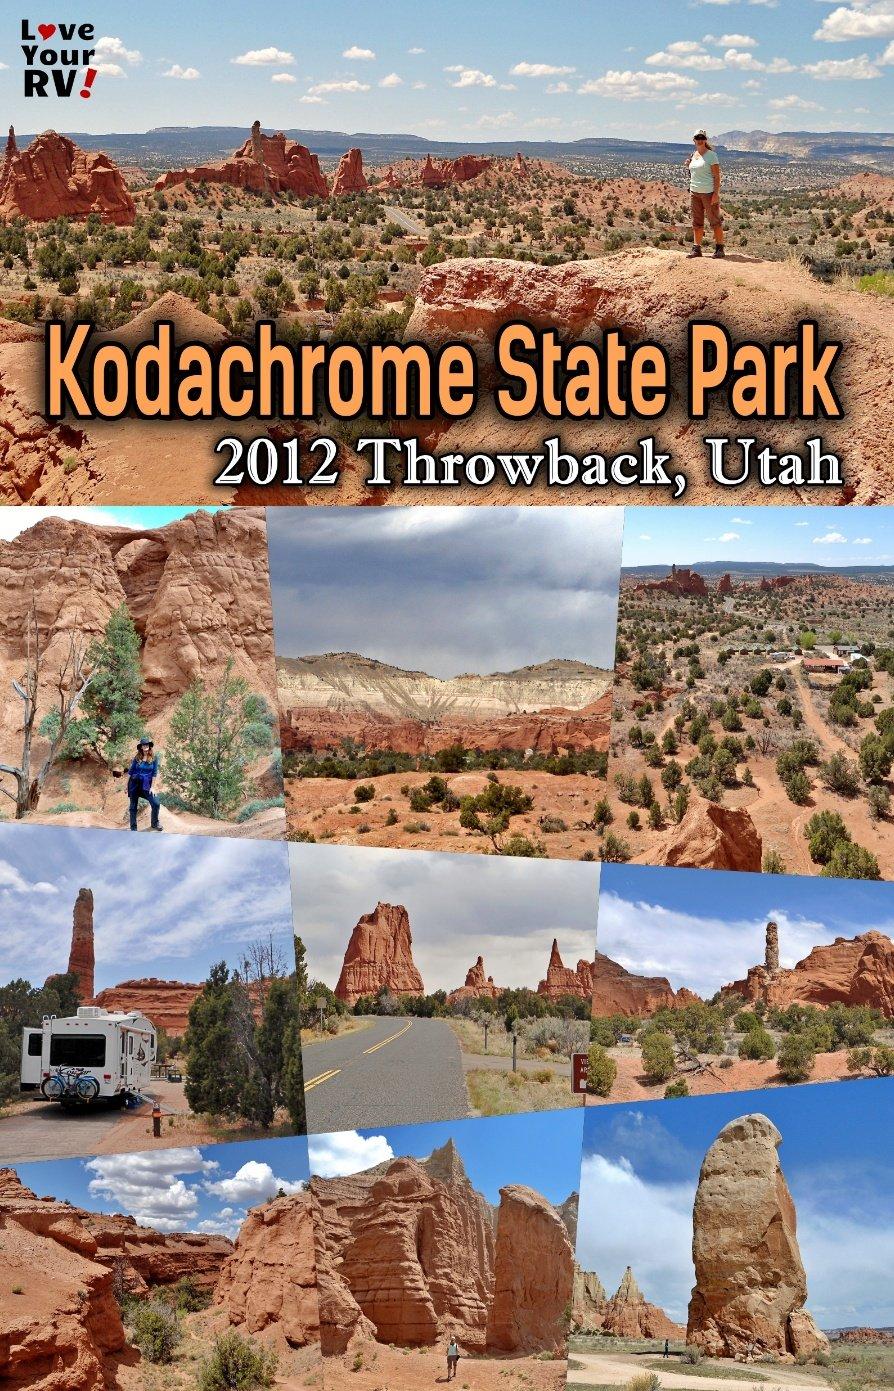 Kodachrome Basin State Park, Utah - 2012 Throwback Video Series